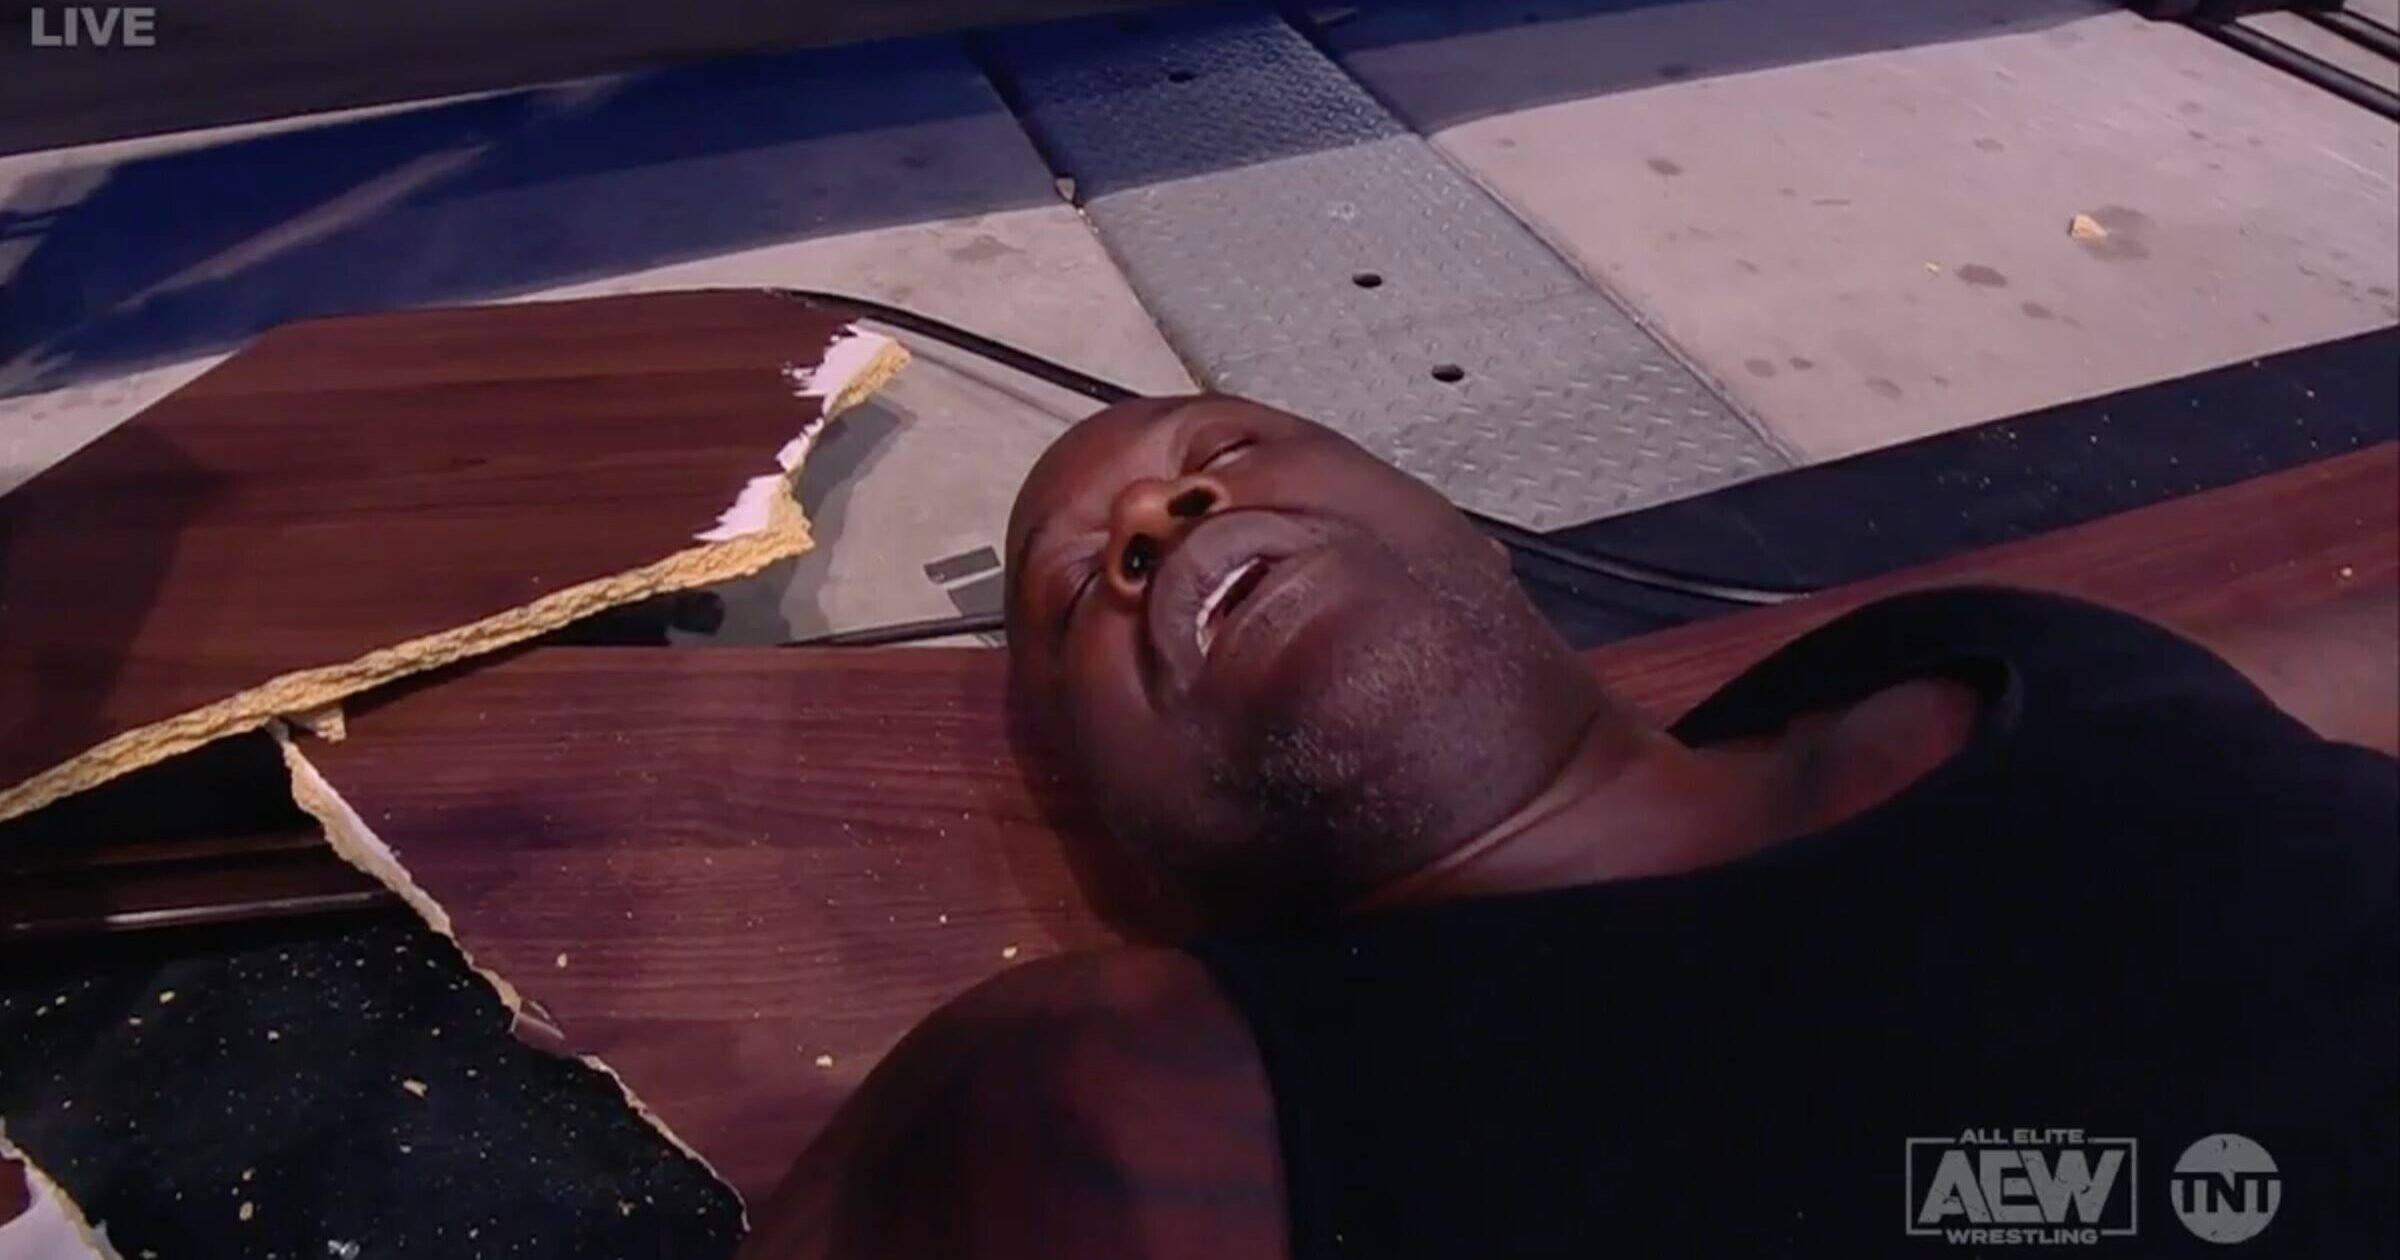 WATCH: Shaq Gets Plowed Through Table in All Elite Wrestling Match - Mediaite